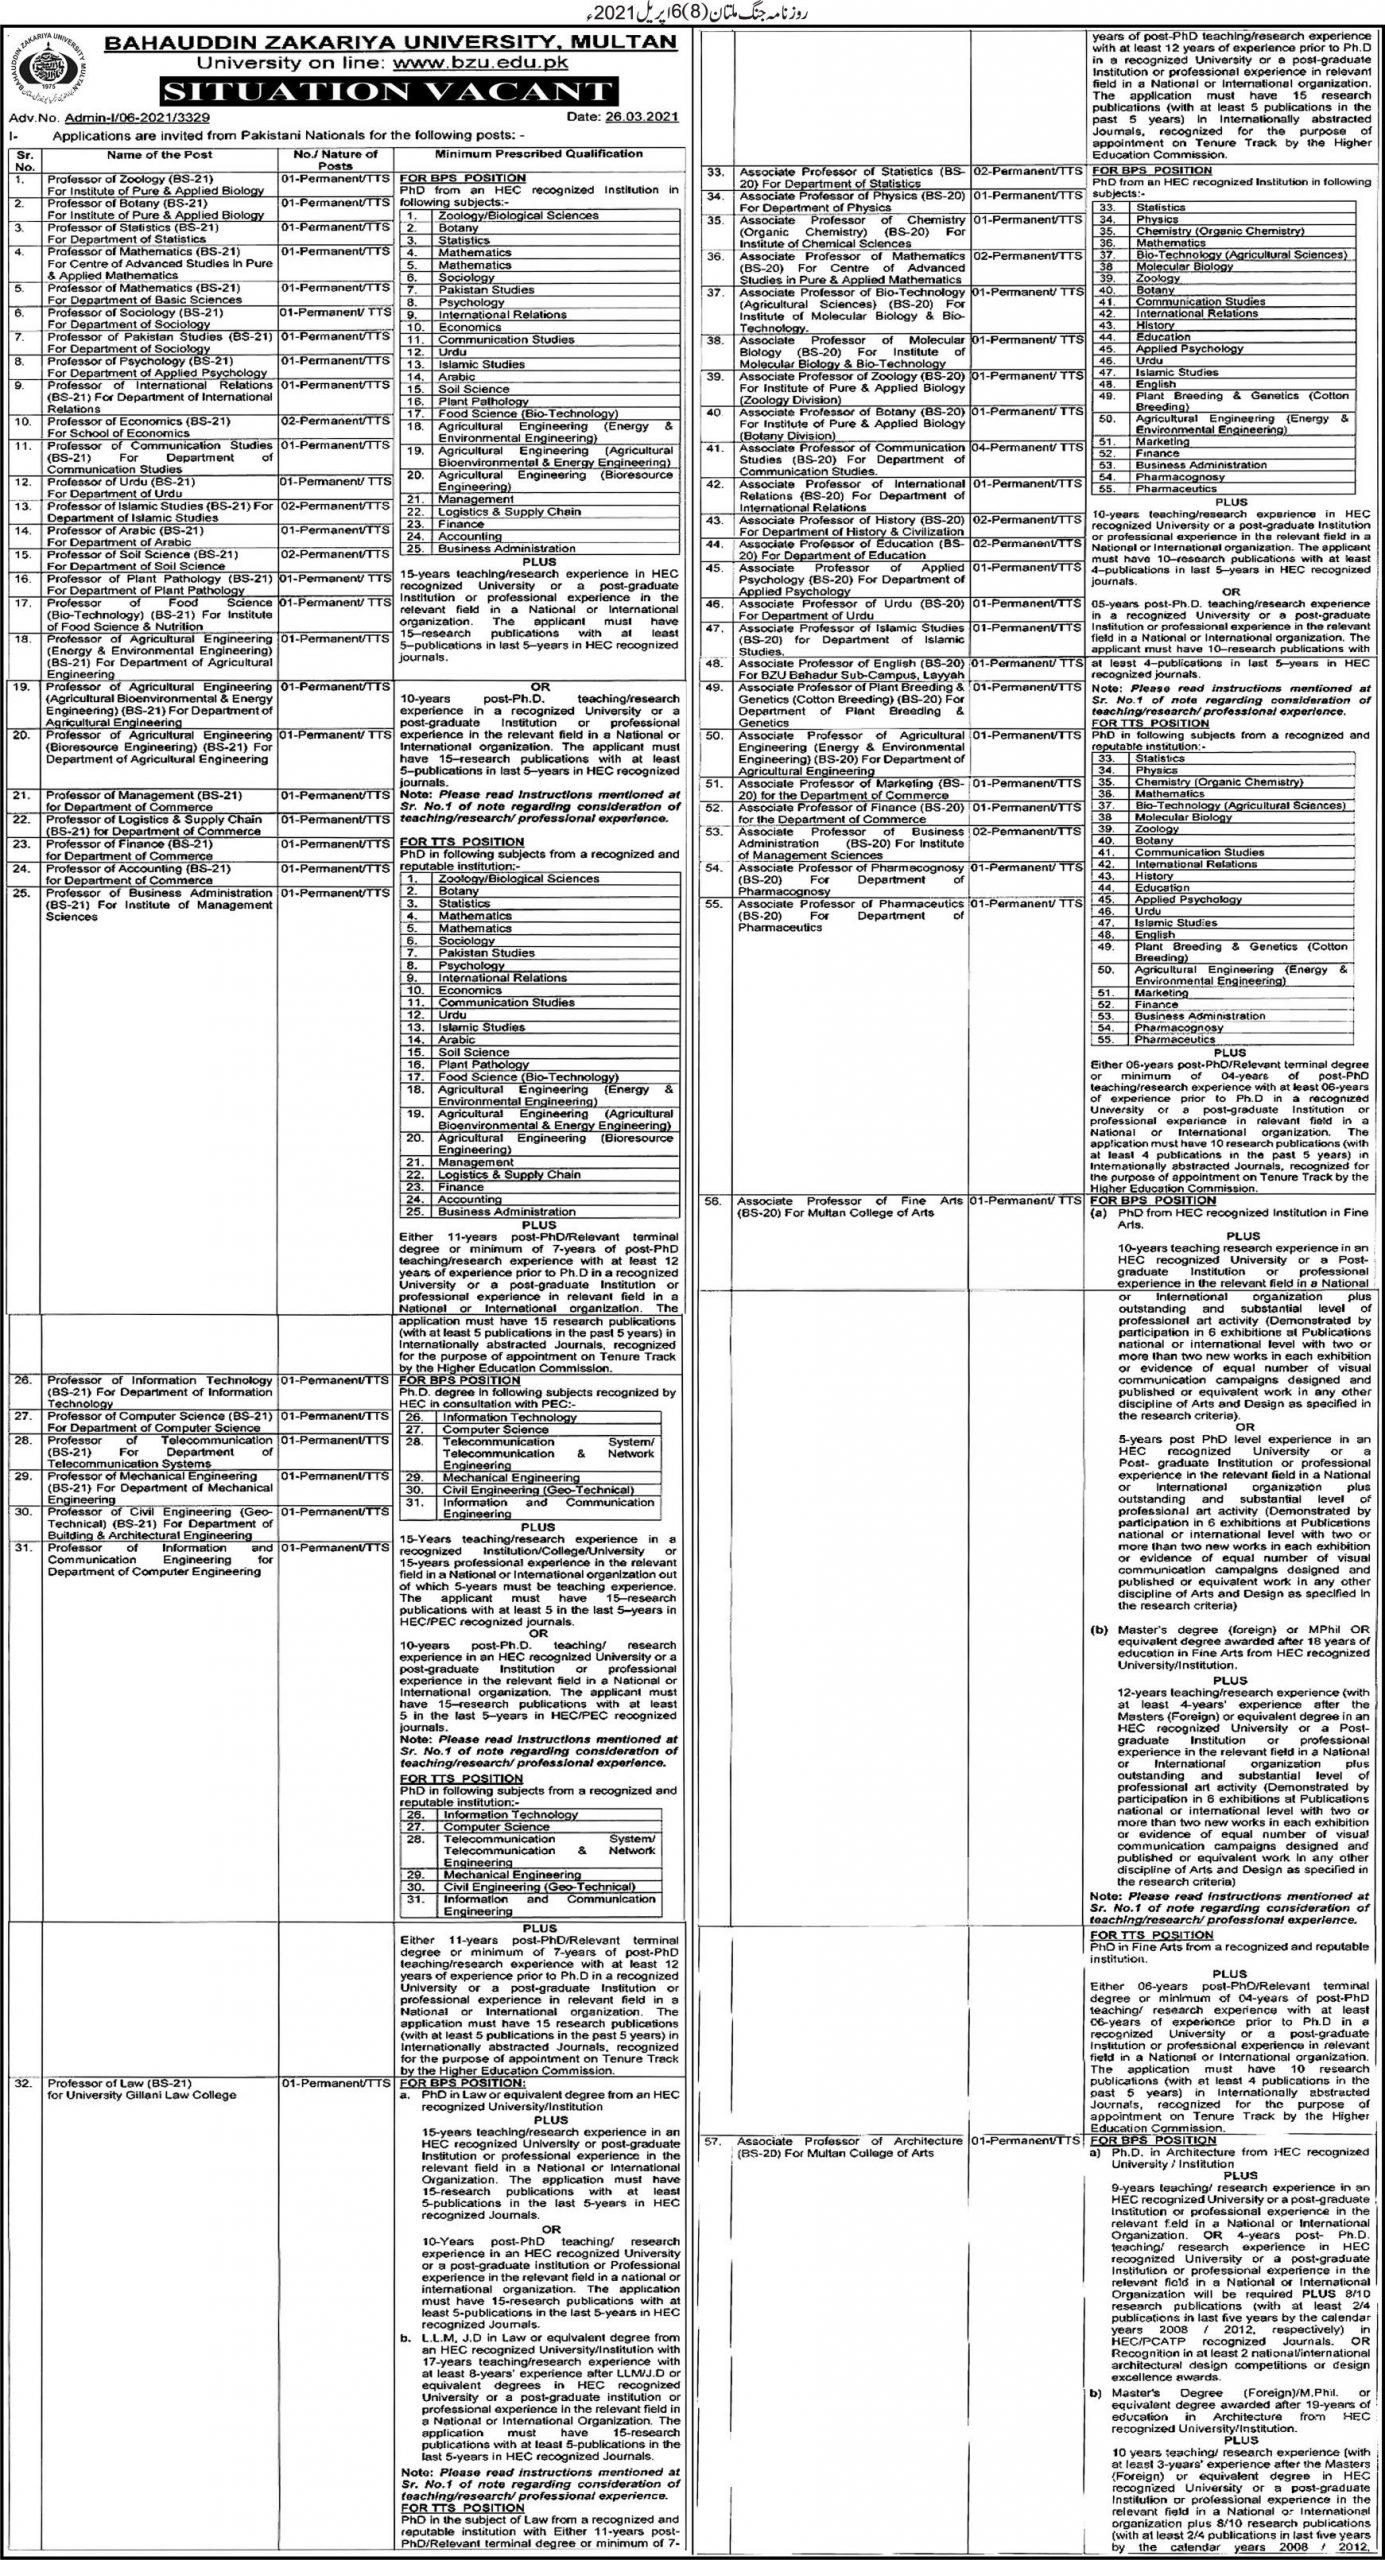 Jobs in Bahauddin Zakariya University BZU Faculty in Multan 2021